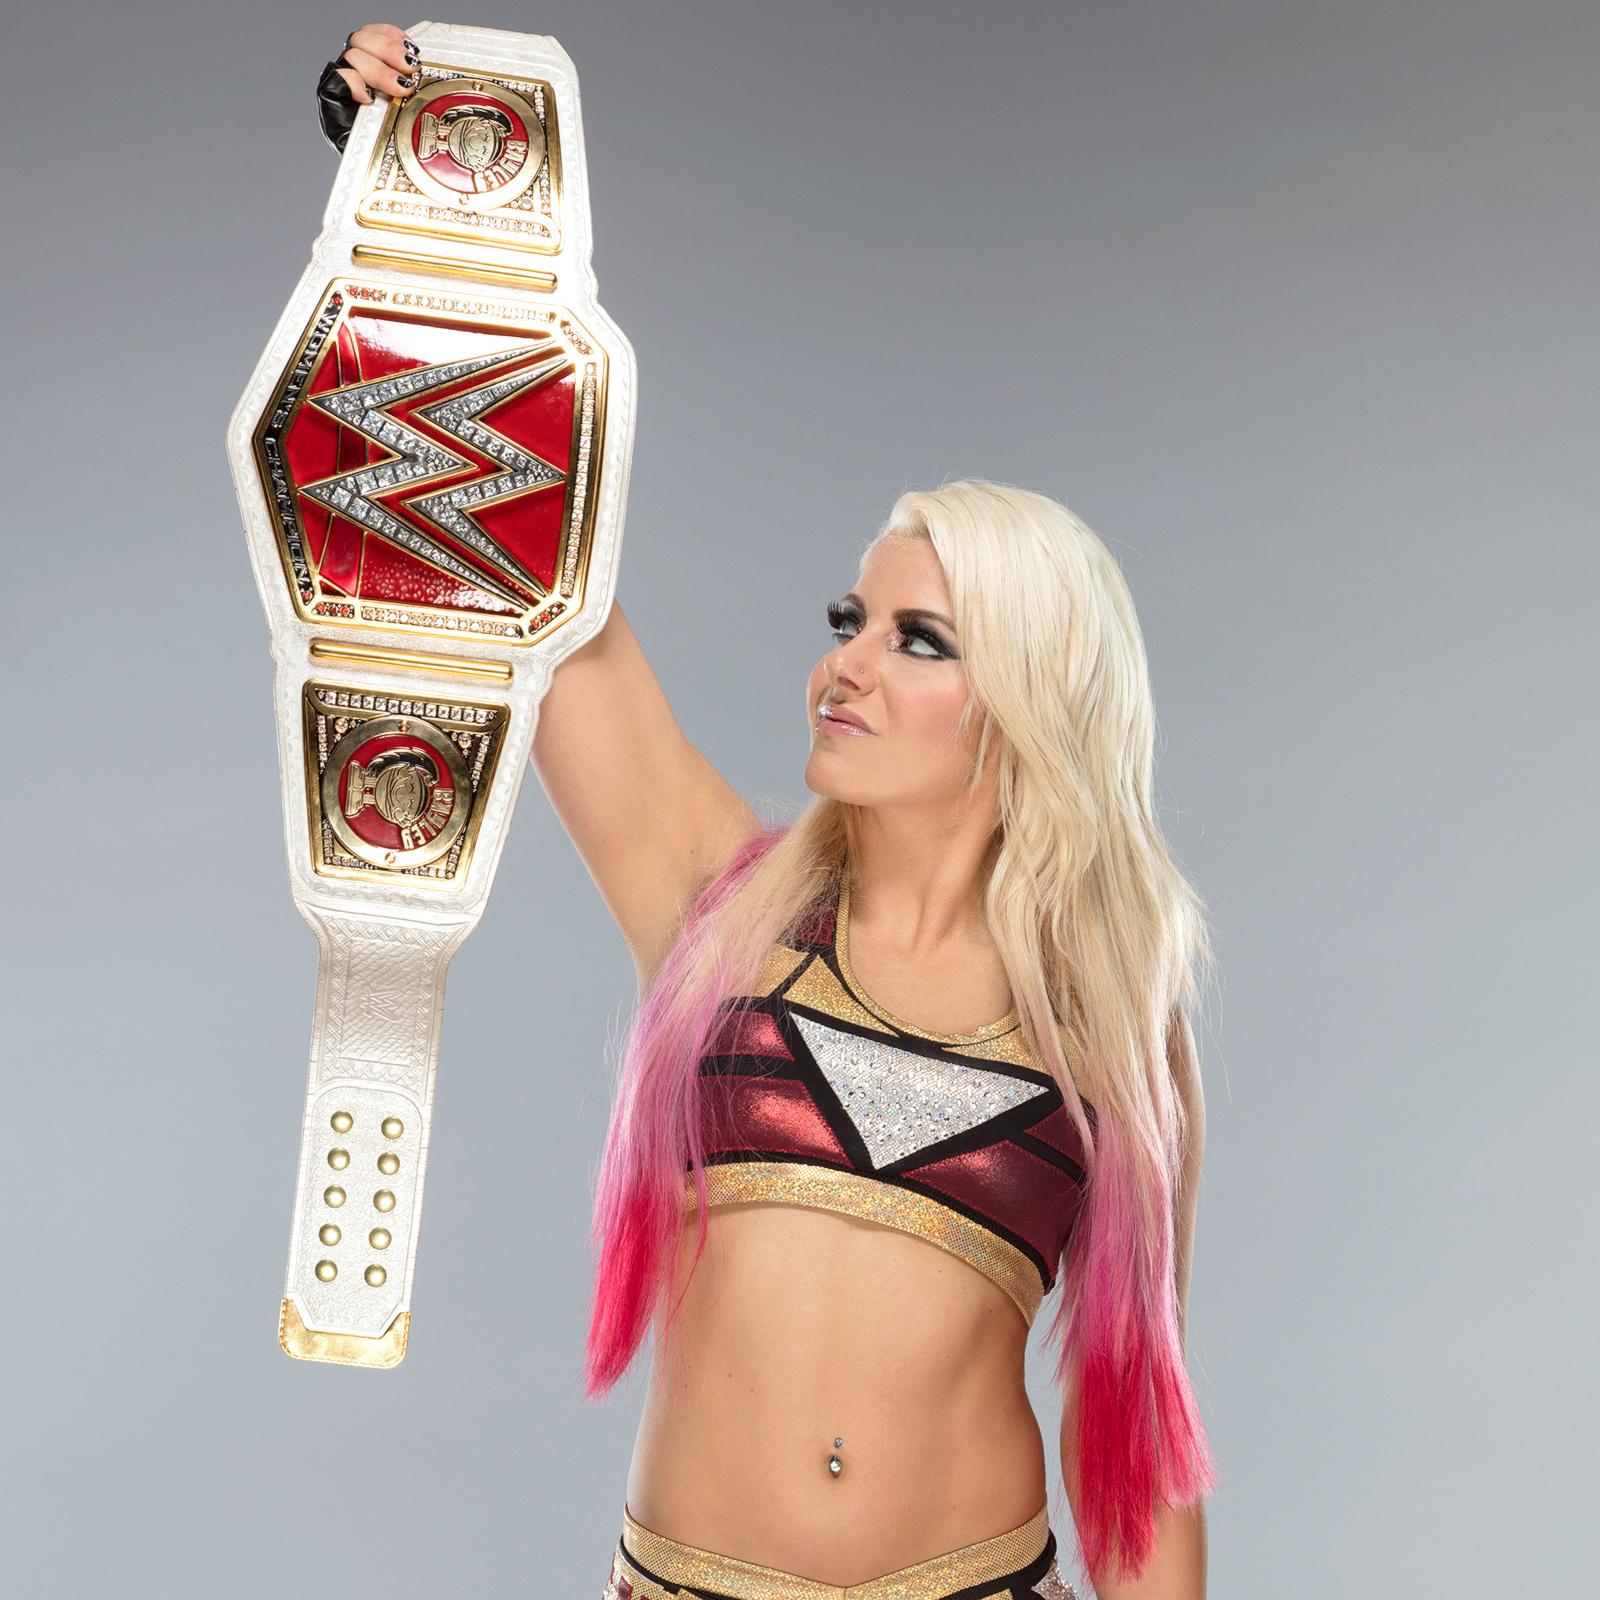 Alexa Bliss 2017 : Alexa Bliss: New Raw Womens Championship -07